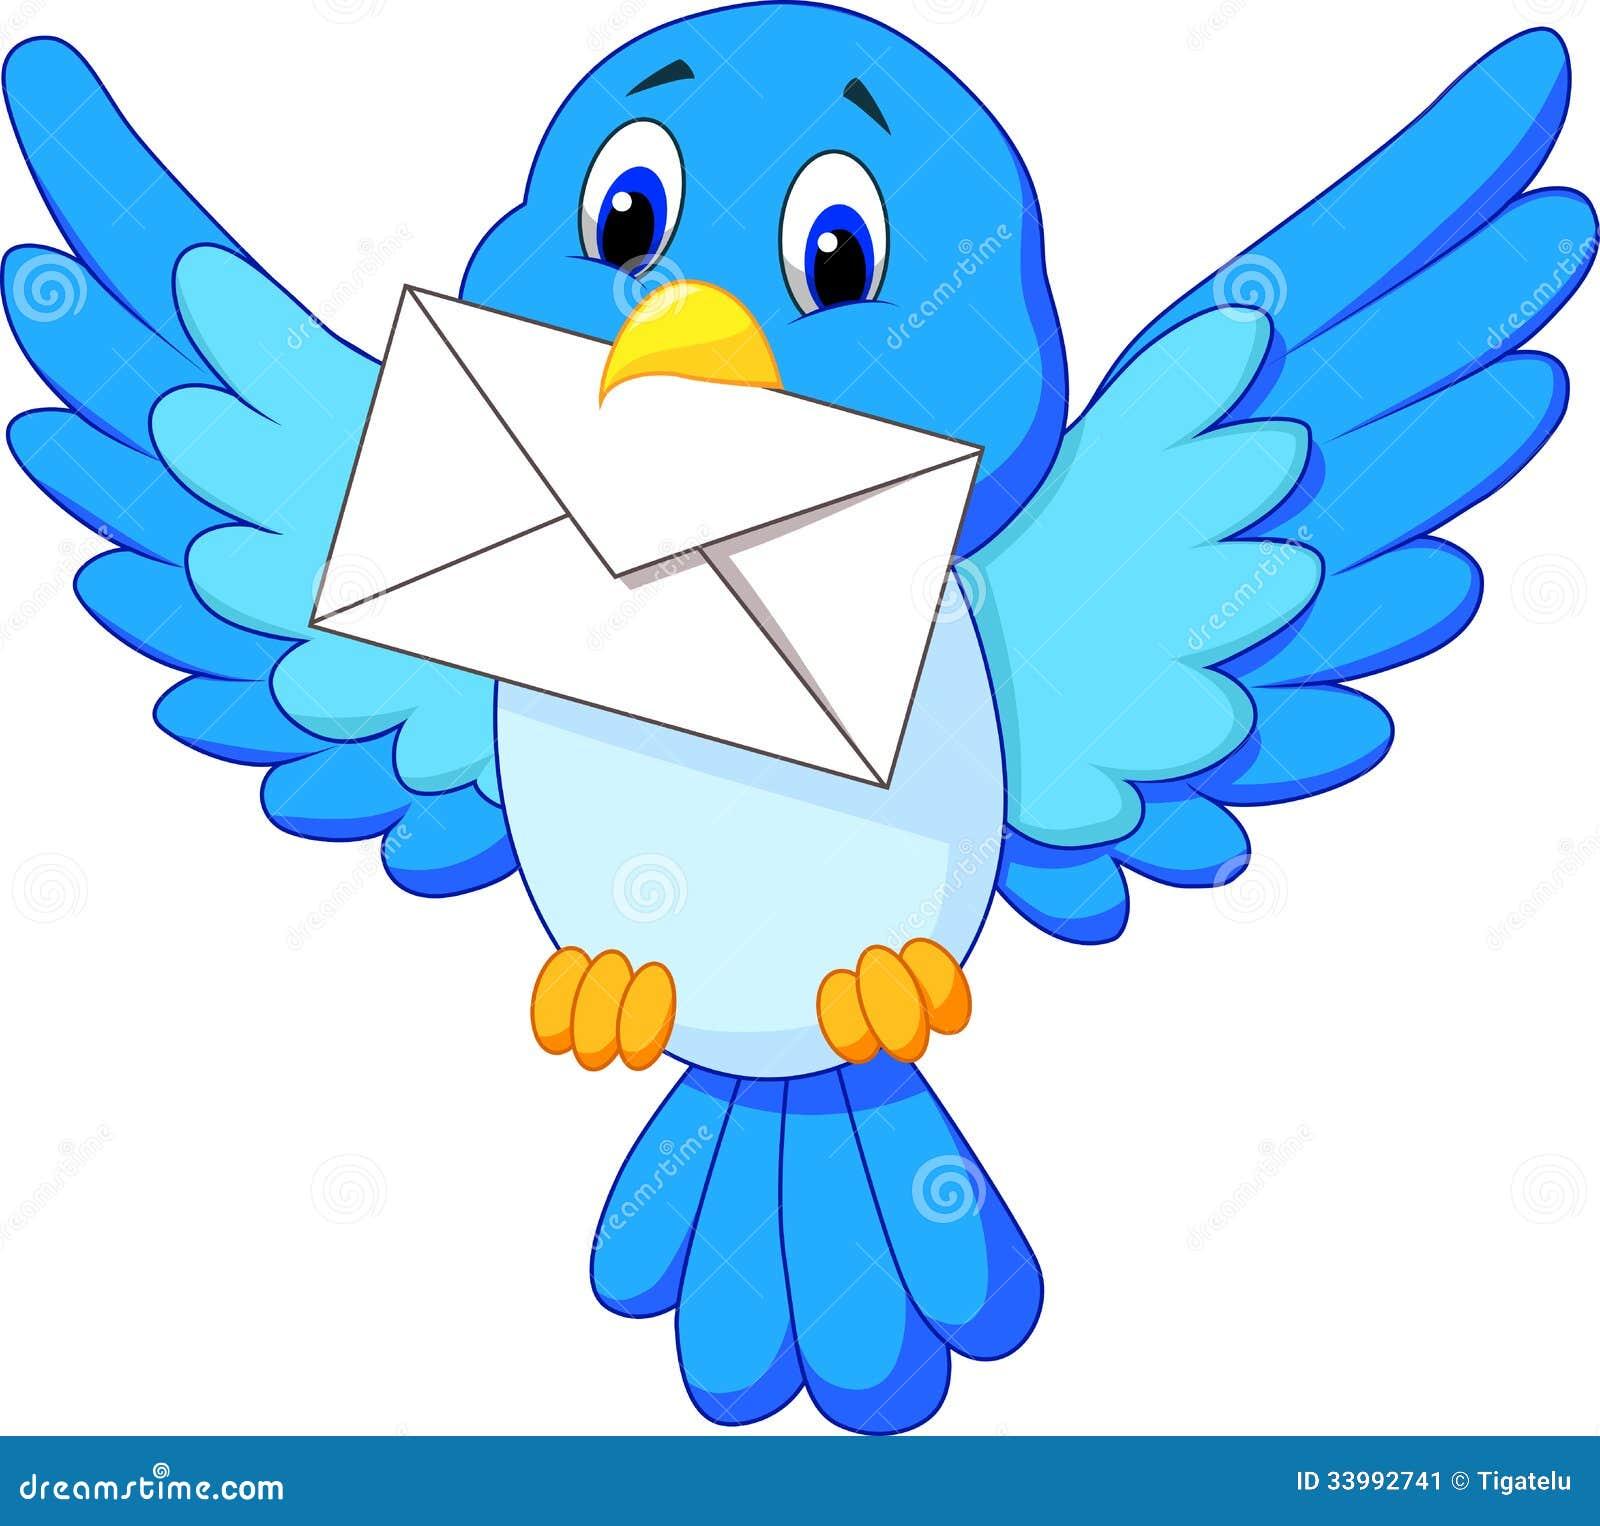 Cute Bird Cartoon Delivering Letter Illustration 33992741 Megapixl